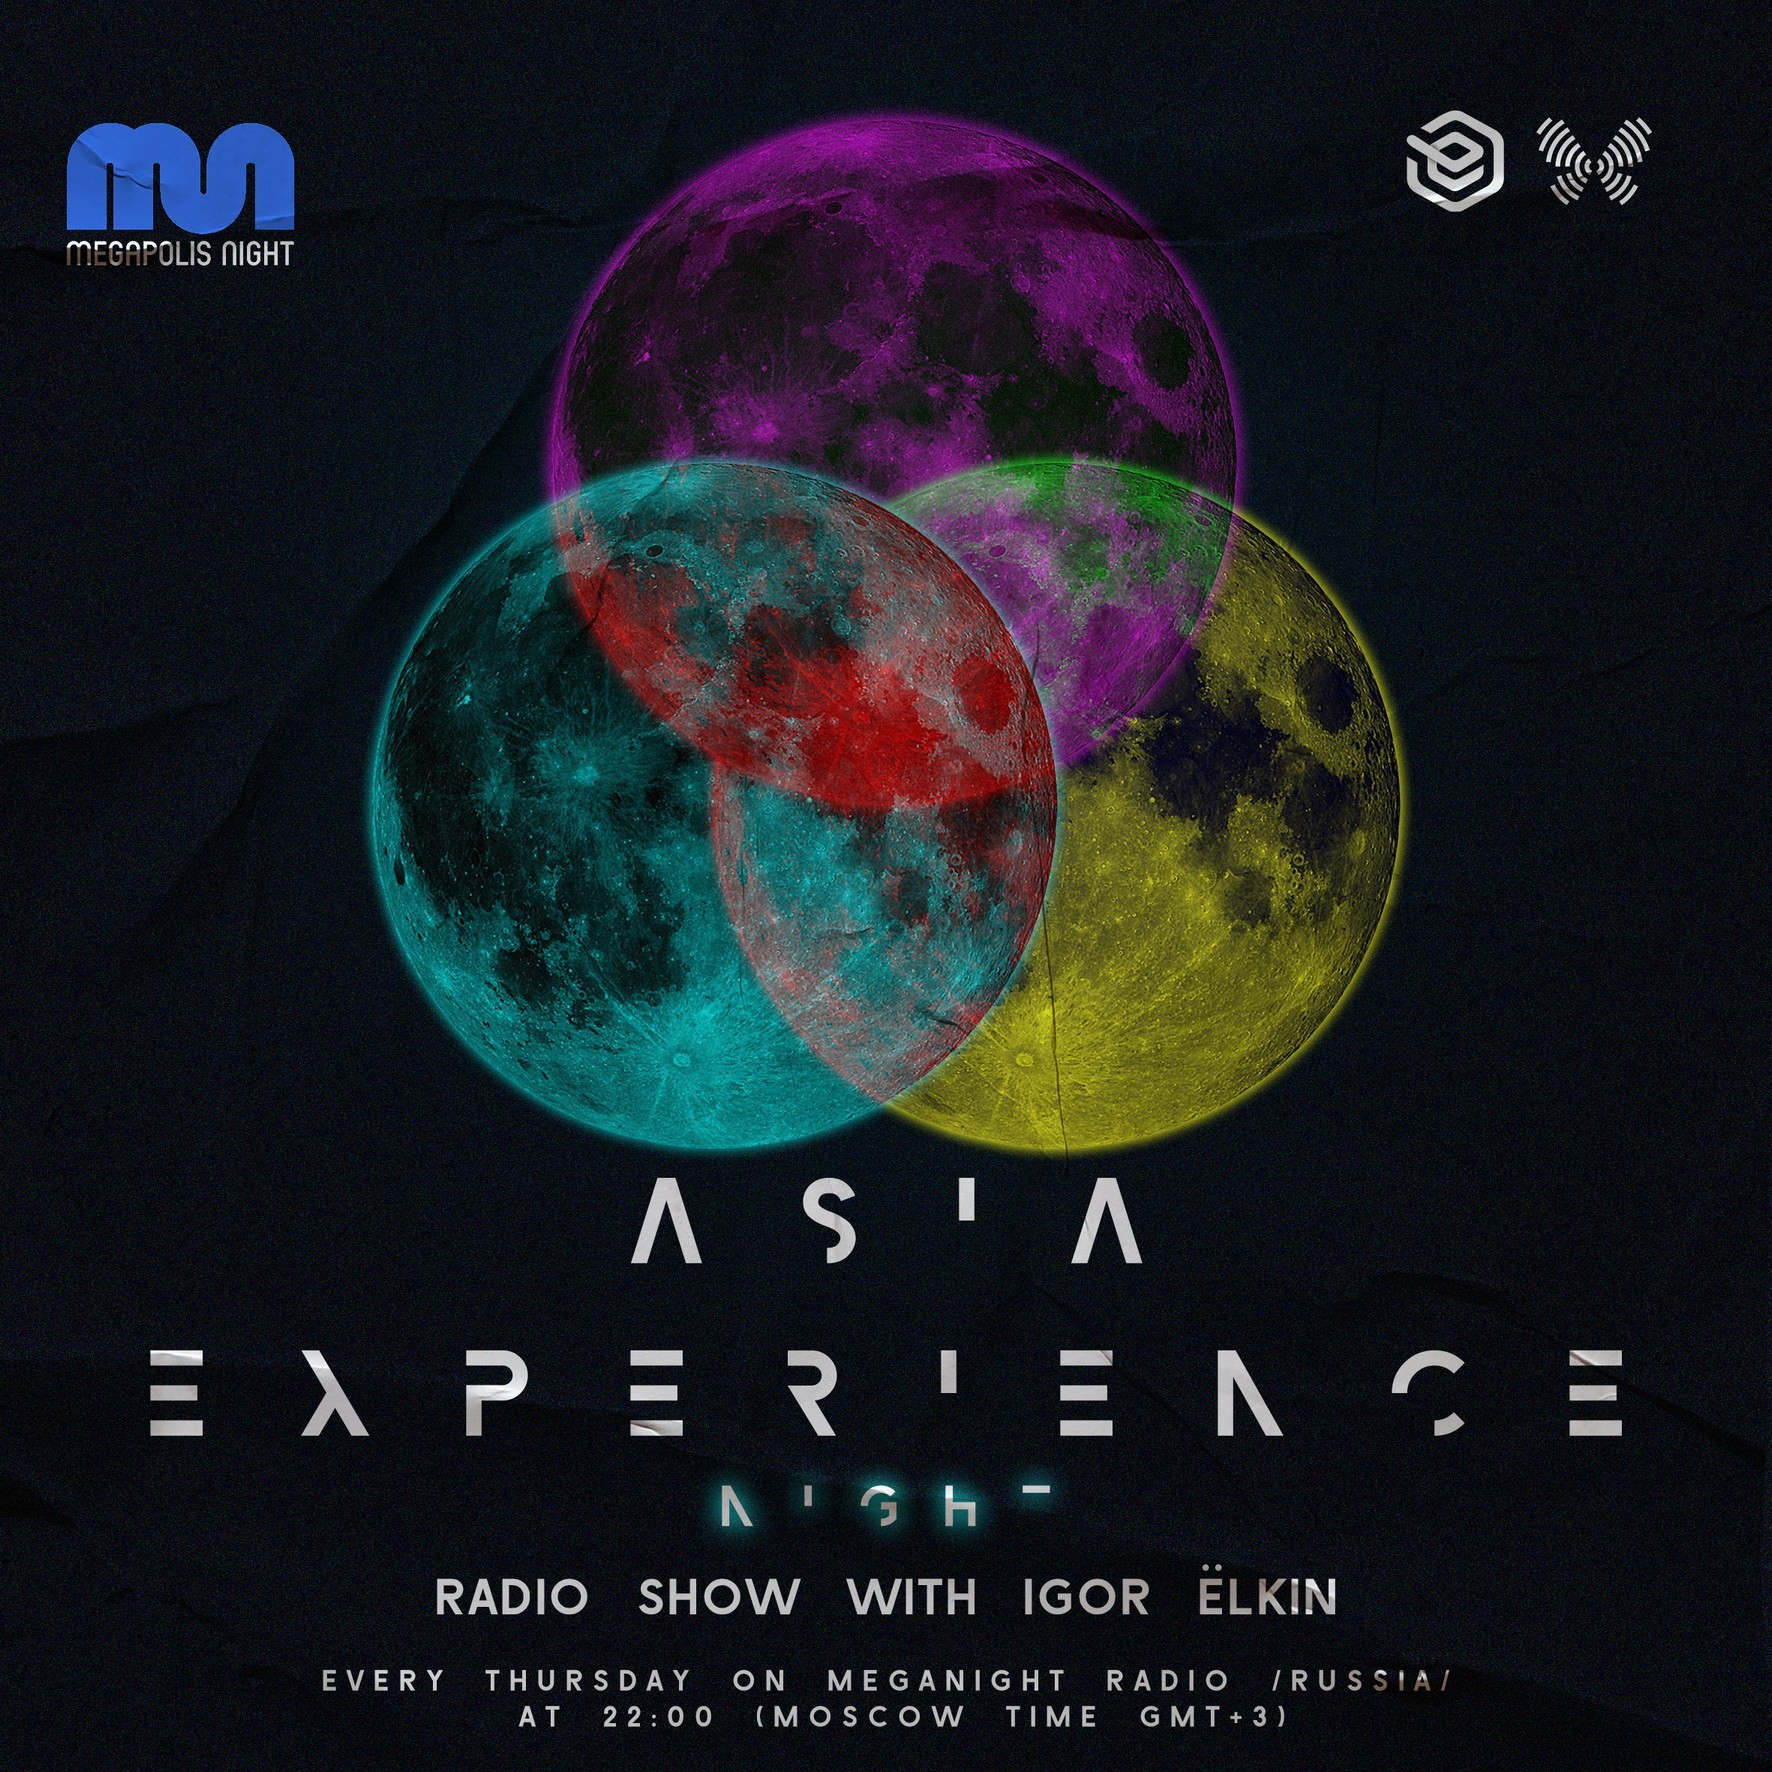 Elkin - Asia Experience Night  Radio Show #047 @ Megapolis Night  15.04.2021 #47